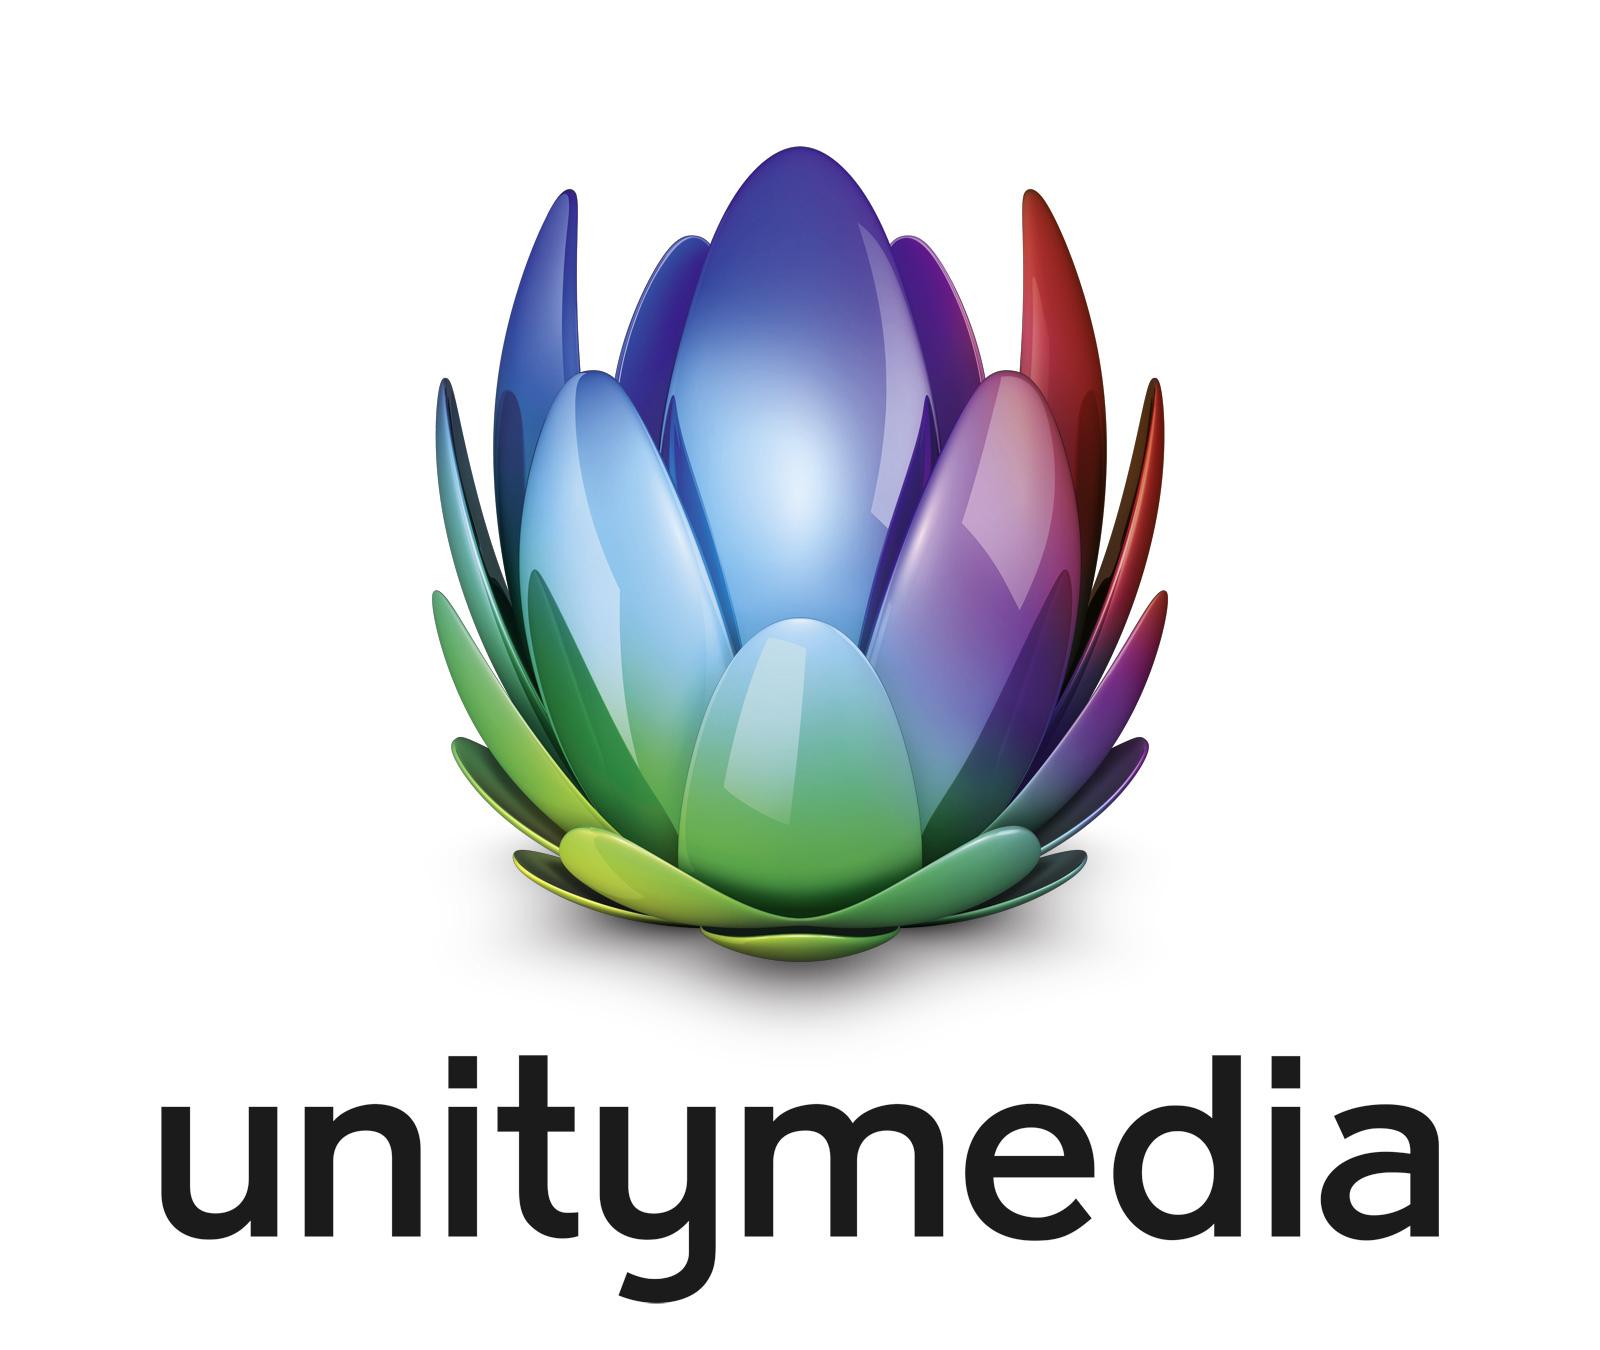 unitymedia prüfen